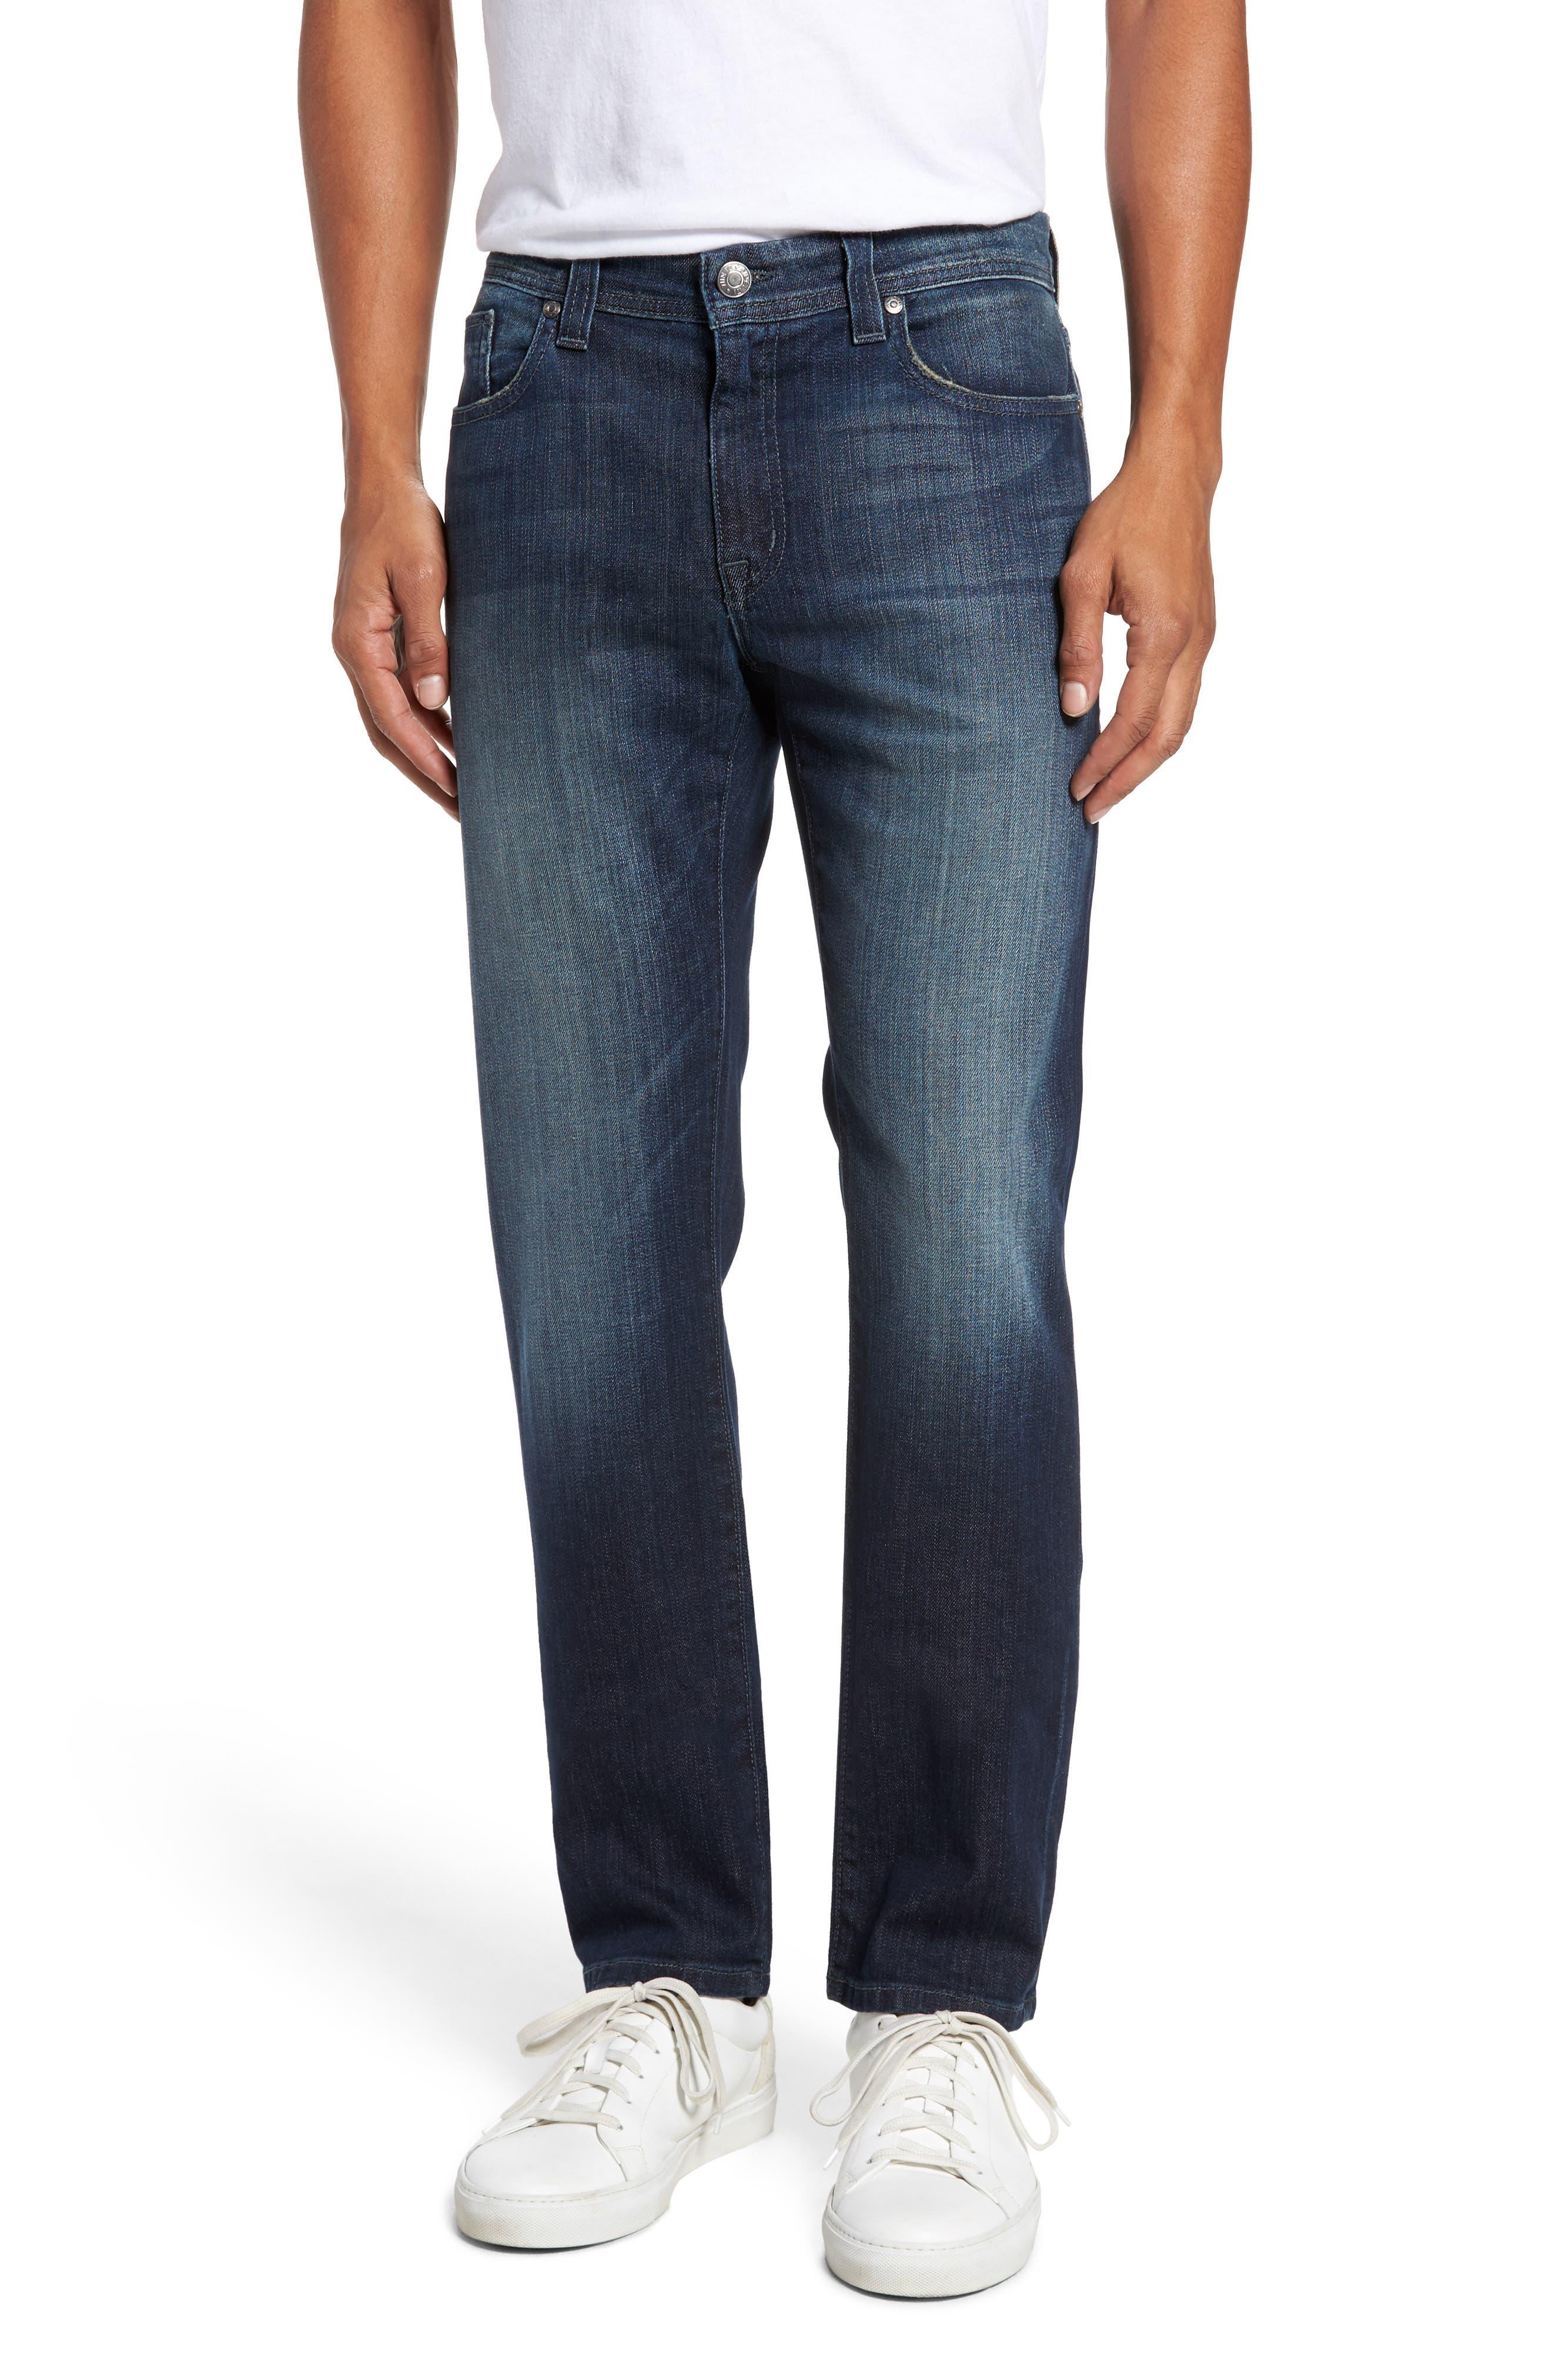 Alternate Image 1 Selected - Fidelity Denim Jimmy Slim Straight Leg Jeans (Militia Blue)